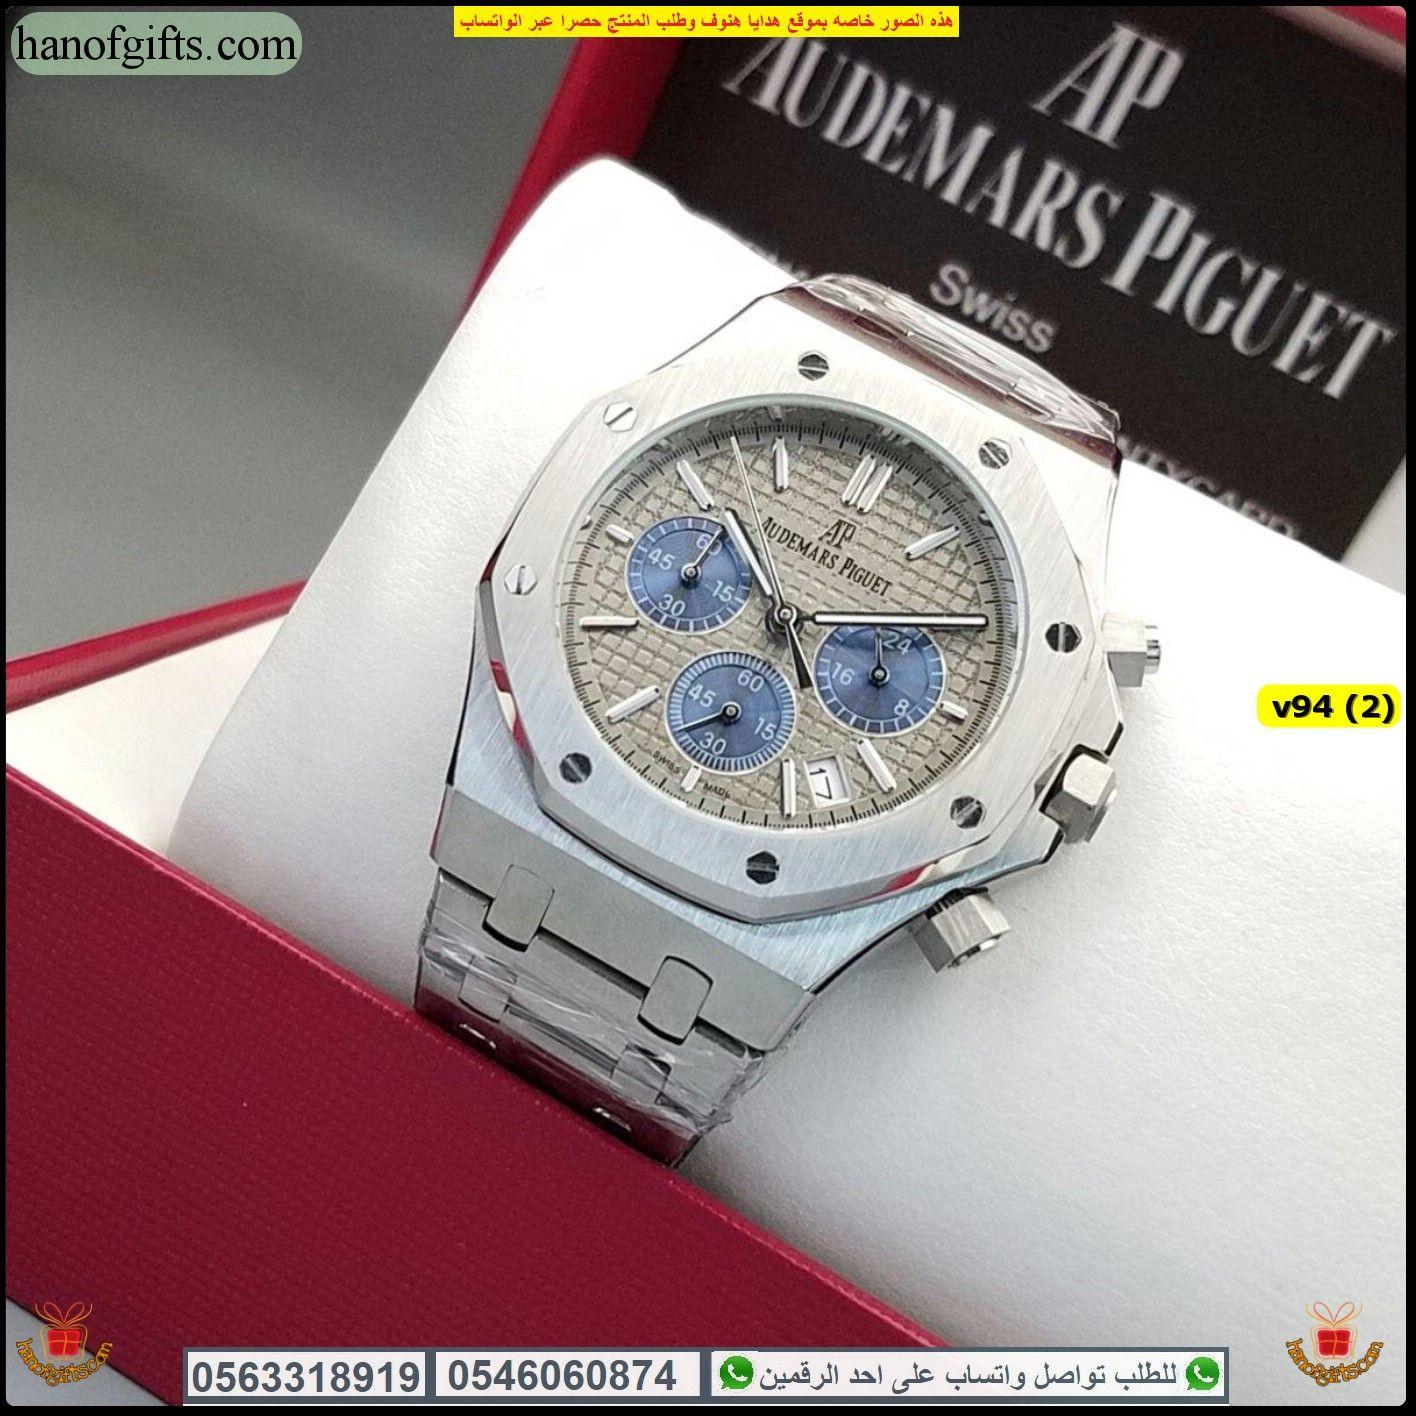 ساعات ادمر رجالي درجه اولى مع علبه فخمه و كرت الماركه هدايا هنوف Rolex Watches Accessories Rolex